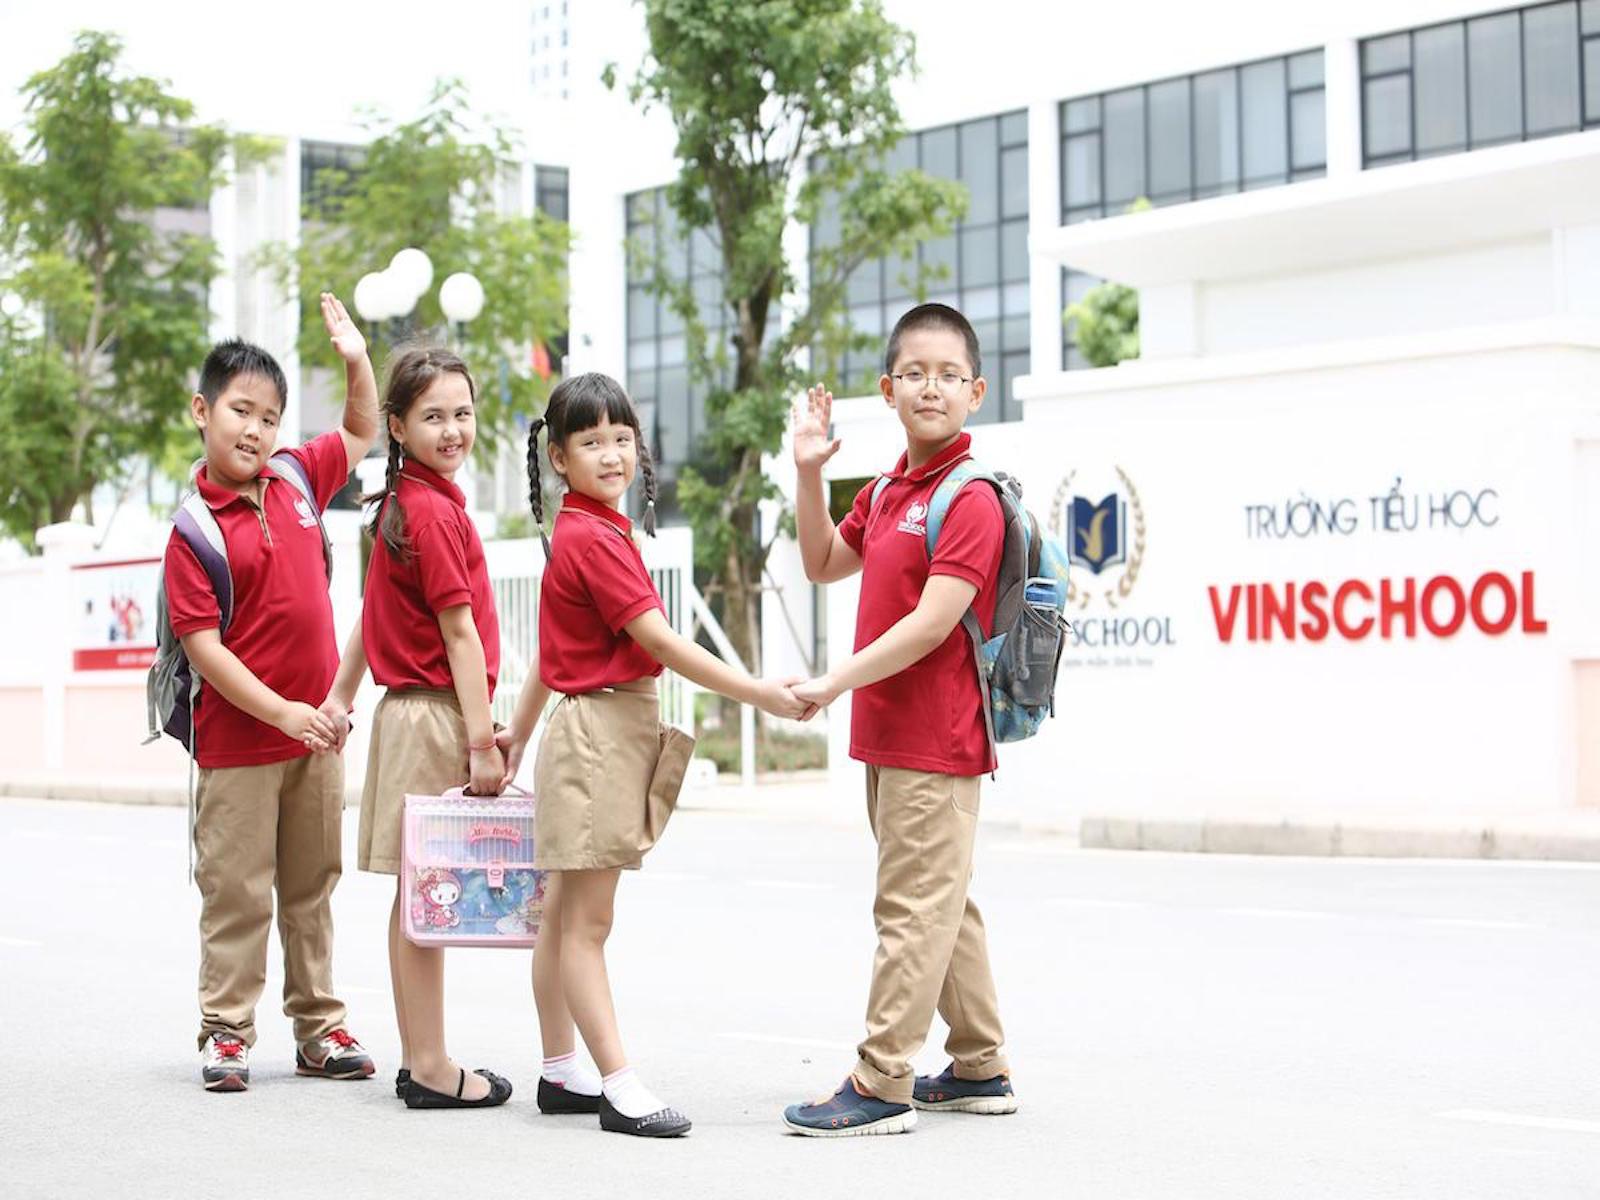 hinh anh Vi sao Vinhomes Central Park la du an duoc quan tam hang dau tai thanh pho Ho Chi Minh  so 18